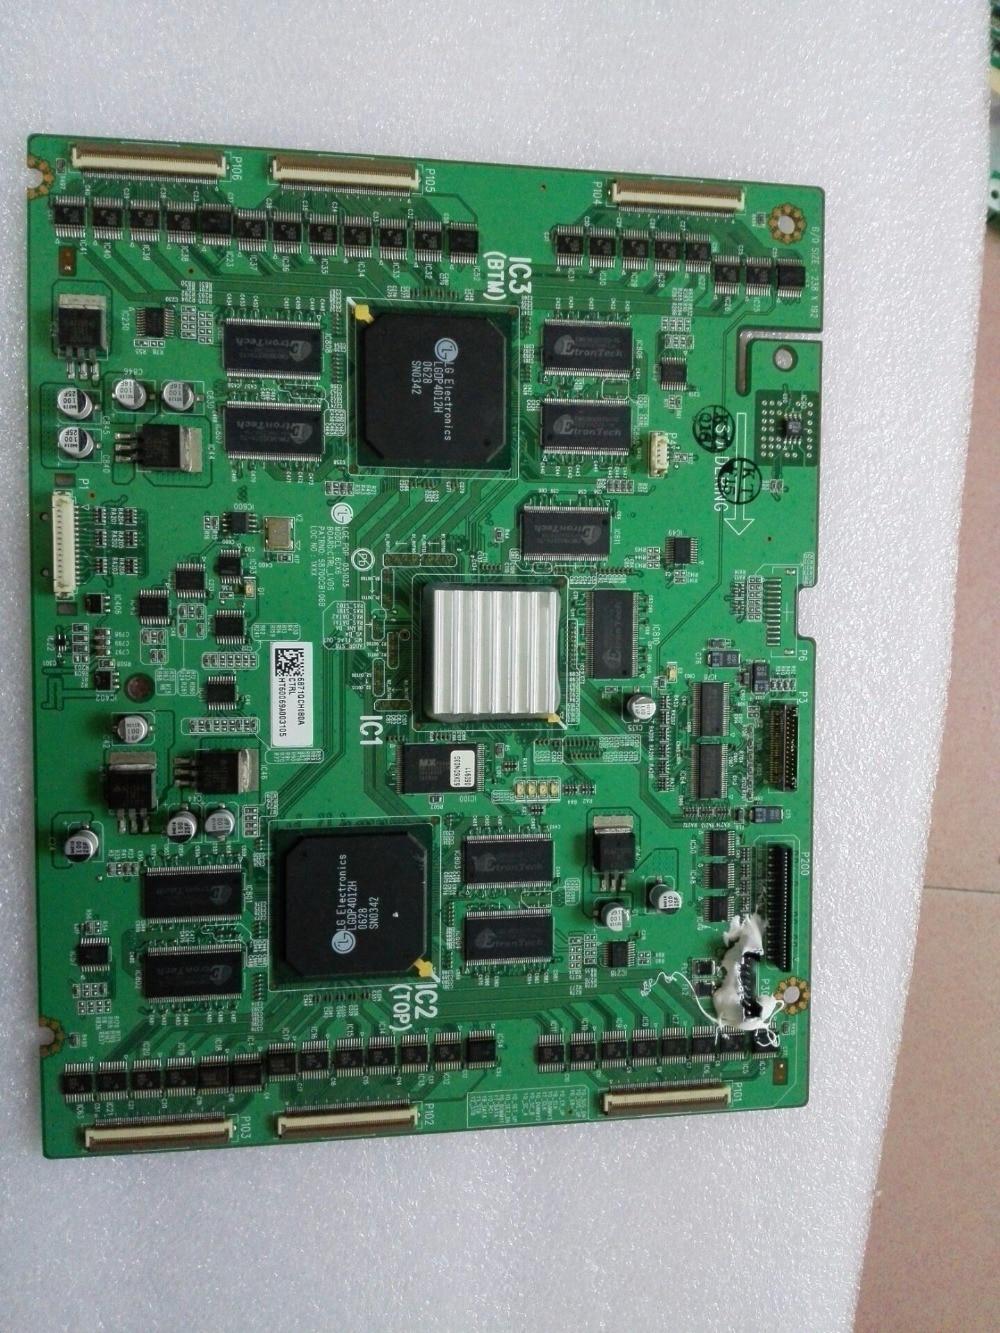 Здесь продается  6870QCB106B 6870QCB006B 6871QCH080A Good Working Tested  Бытовая техника